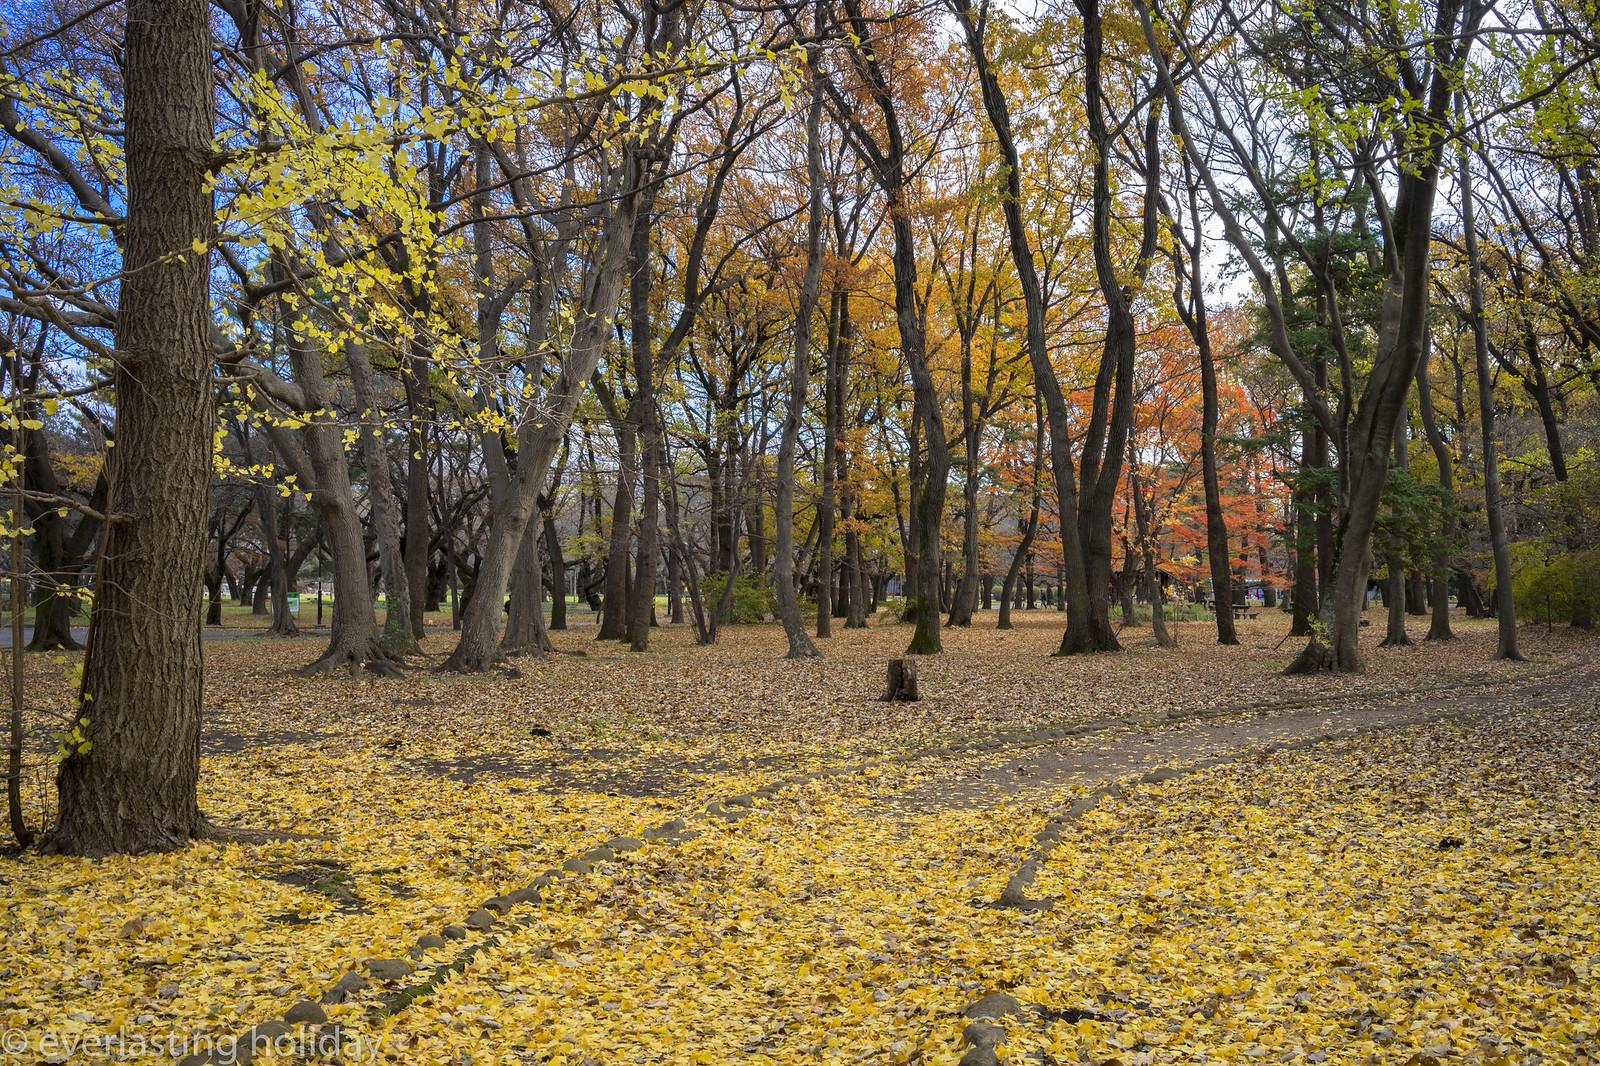 小金井公園 Koganei Park-0011